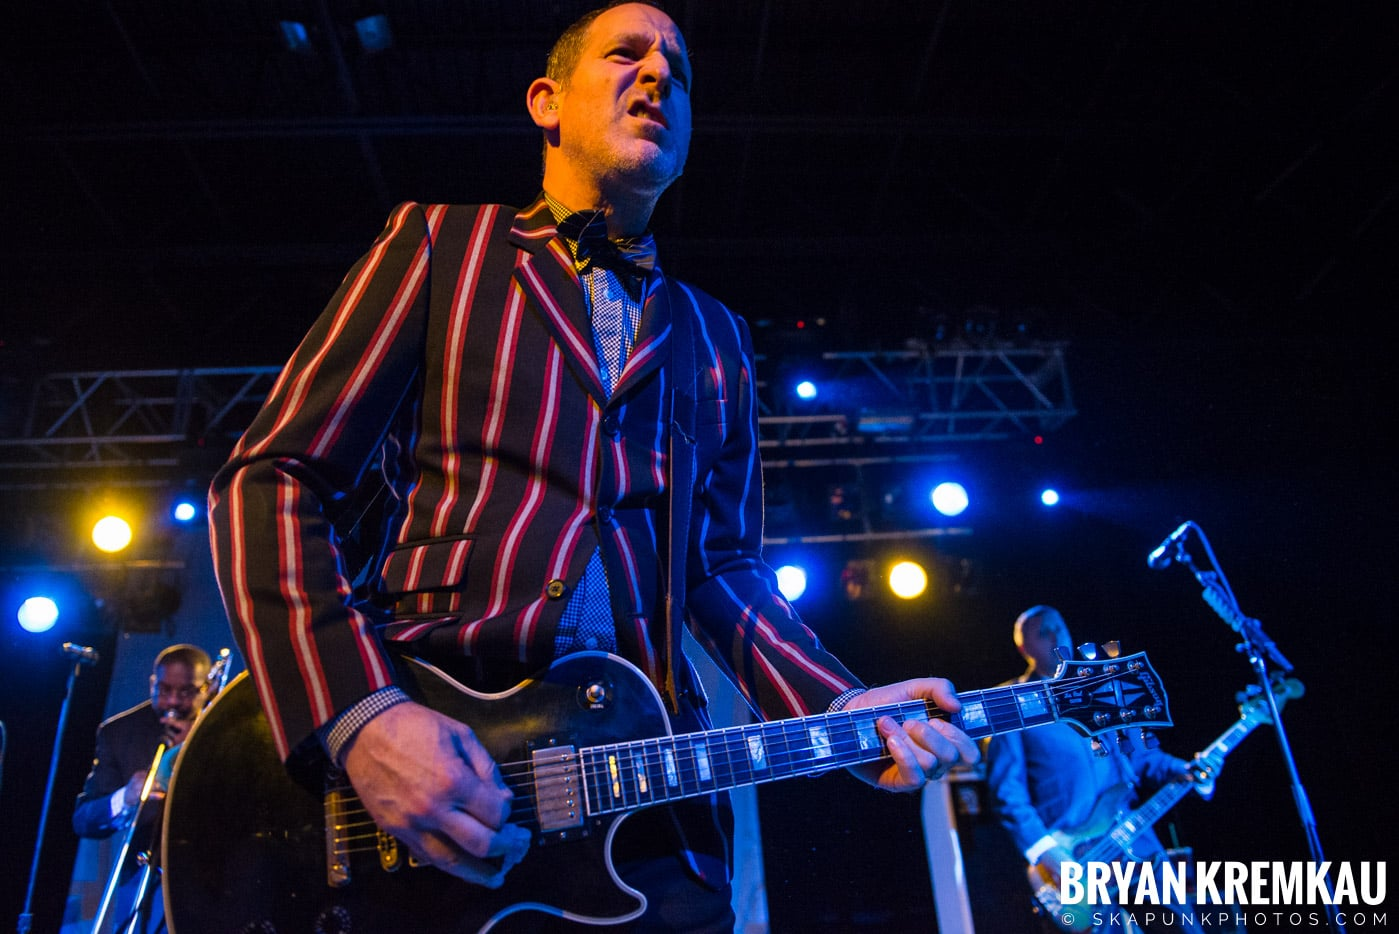 Mighty Mighty Bosstones @ Starland Ballroom, Sayreville, NJ - 7.29.17 (16)